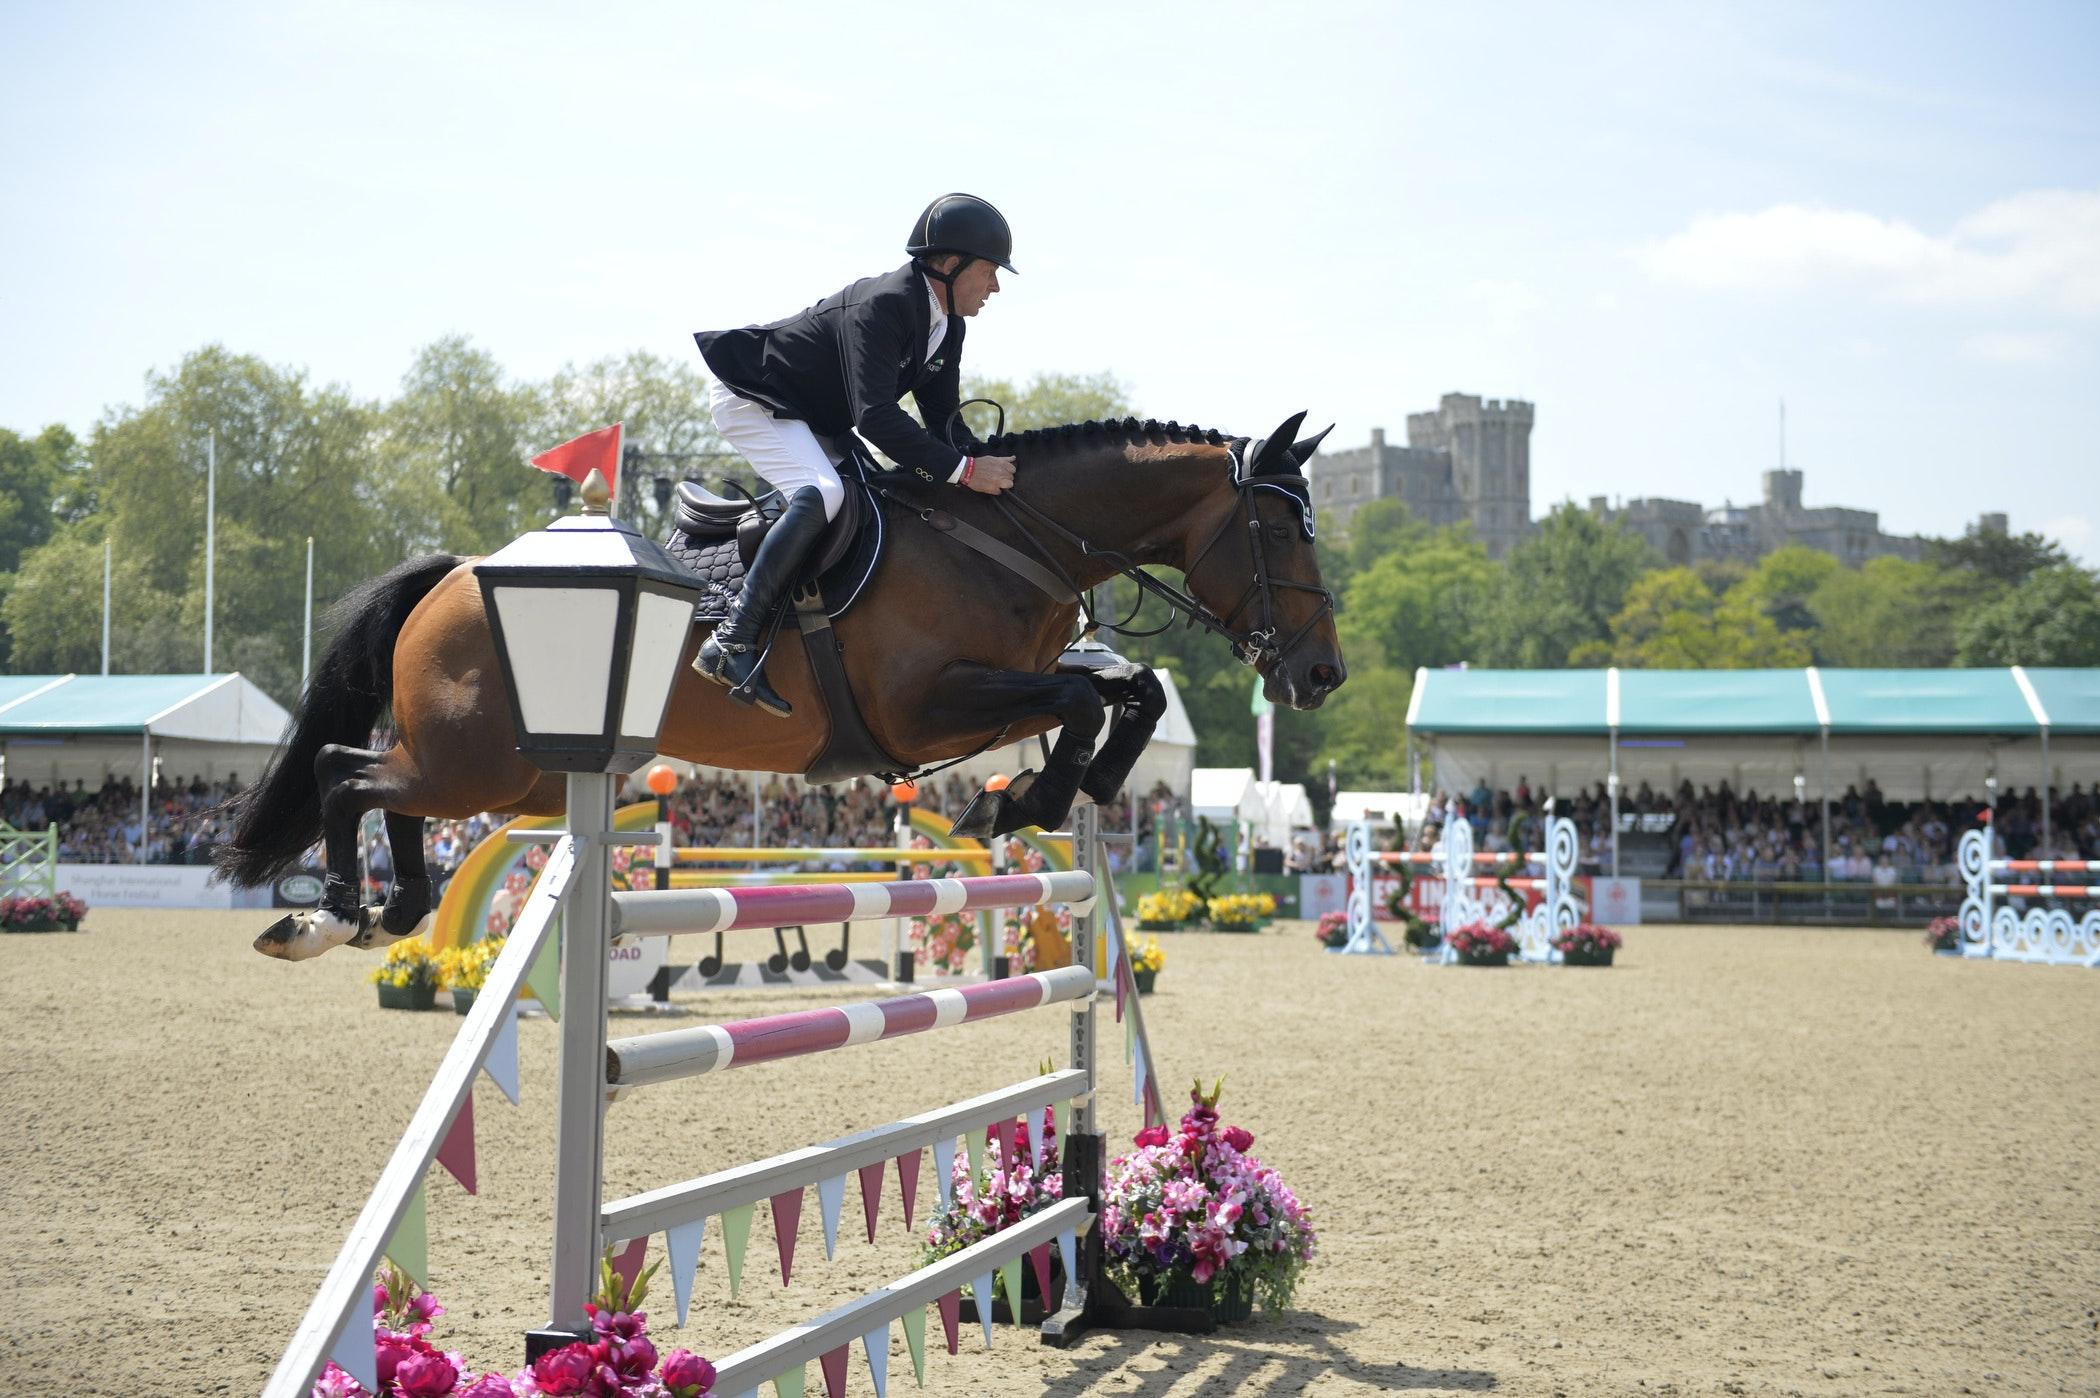 Nick skelton and big star at royal windsor horse show 2014